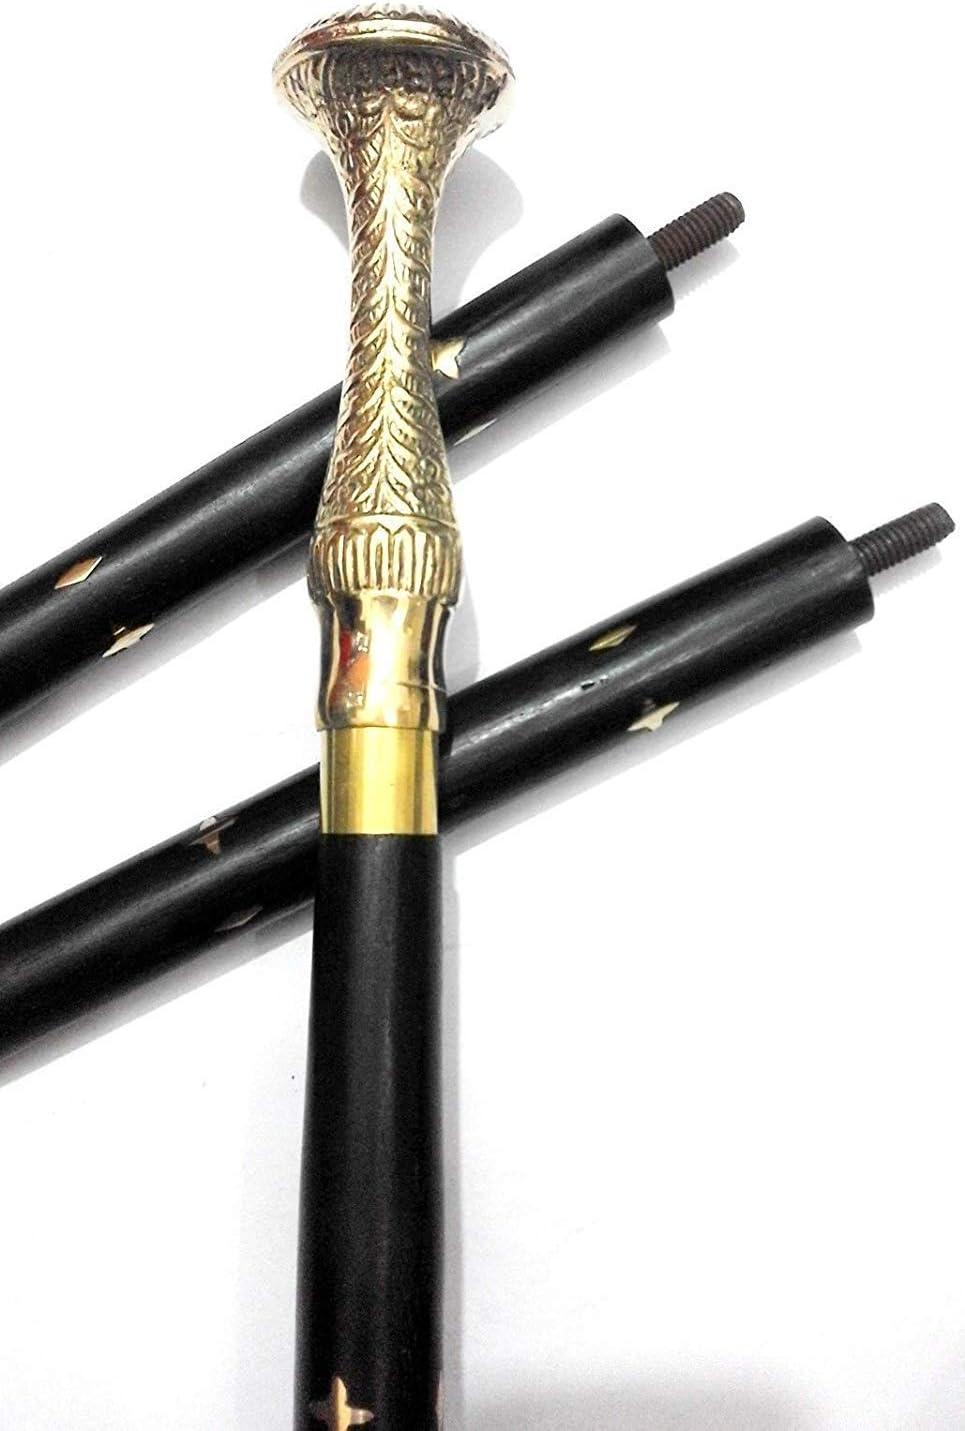 Solid Brass Designer Ball Handle for Cane Wooden Walking Victorian Sticks Gift